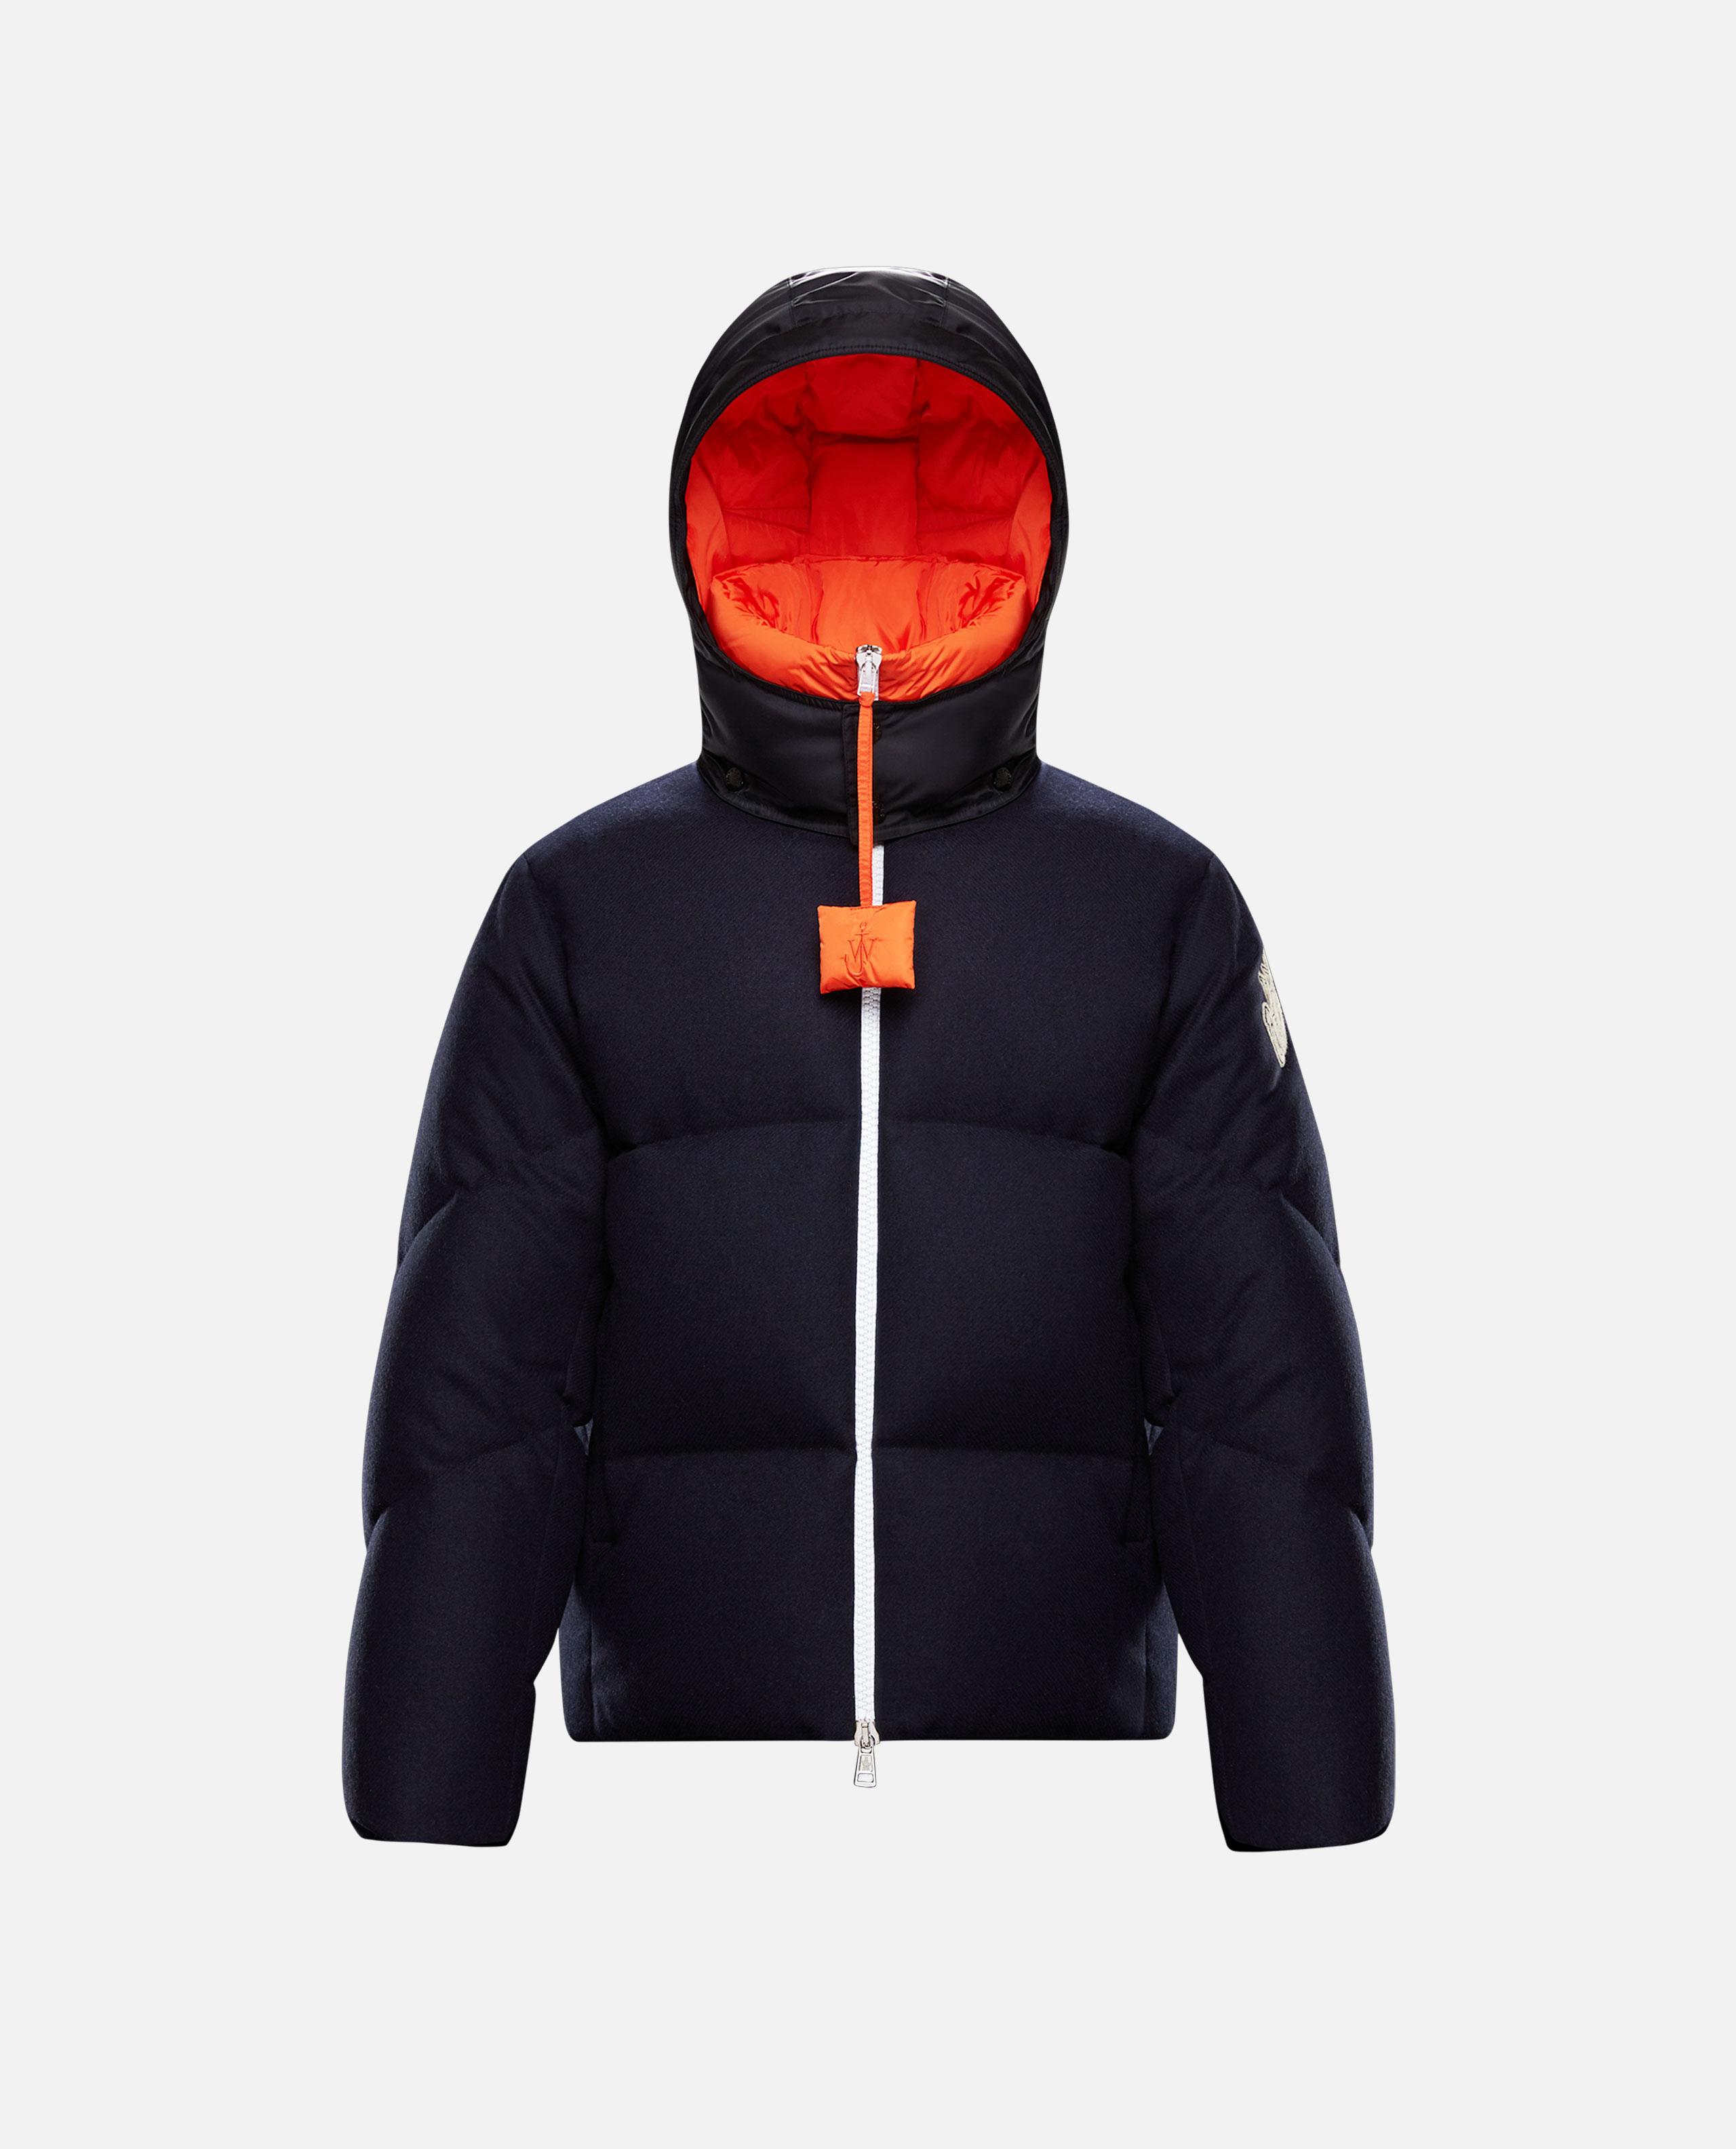 1 Moncler JW Anderson jacket